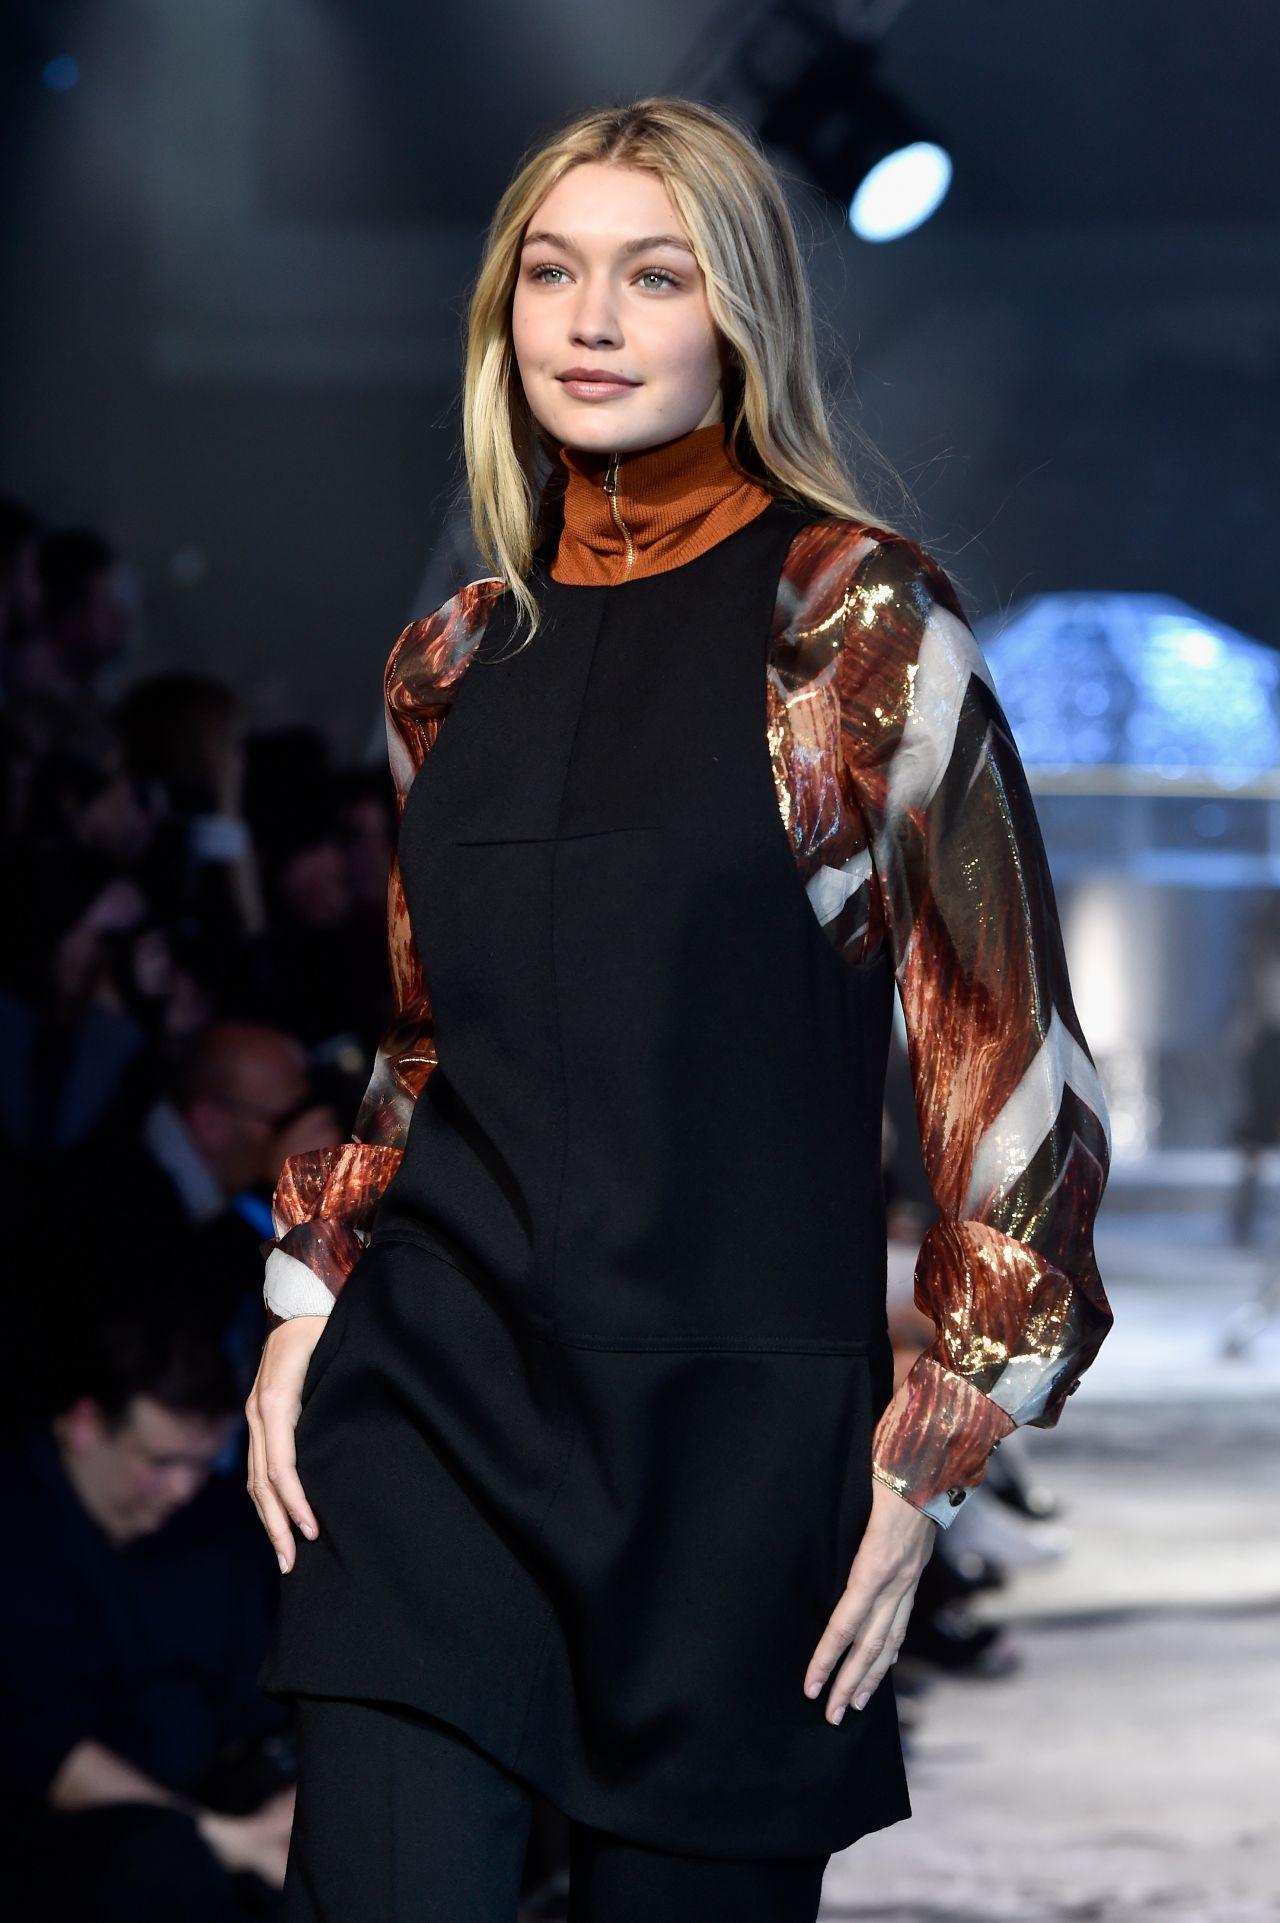 Gigi Hadid - H&M Fashion Show in Paris, March 2015